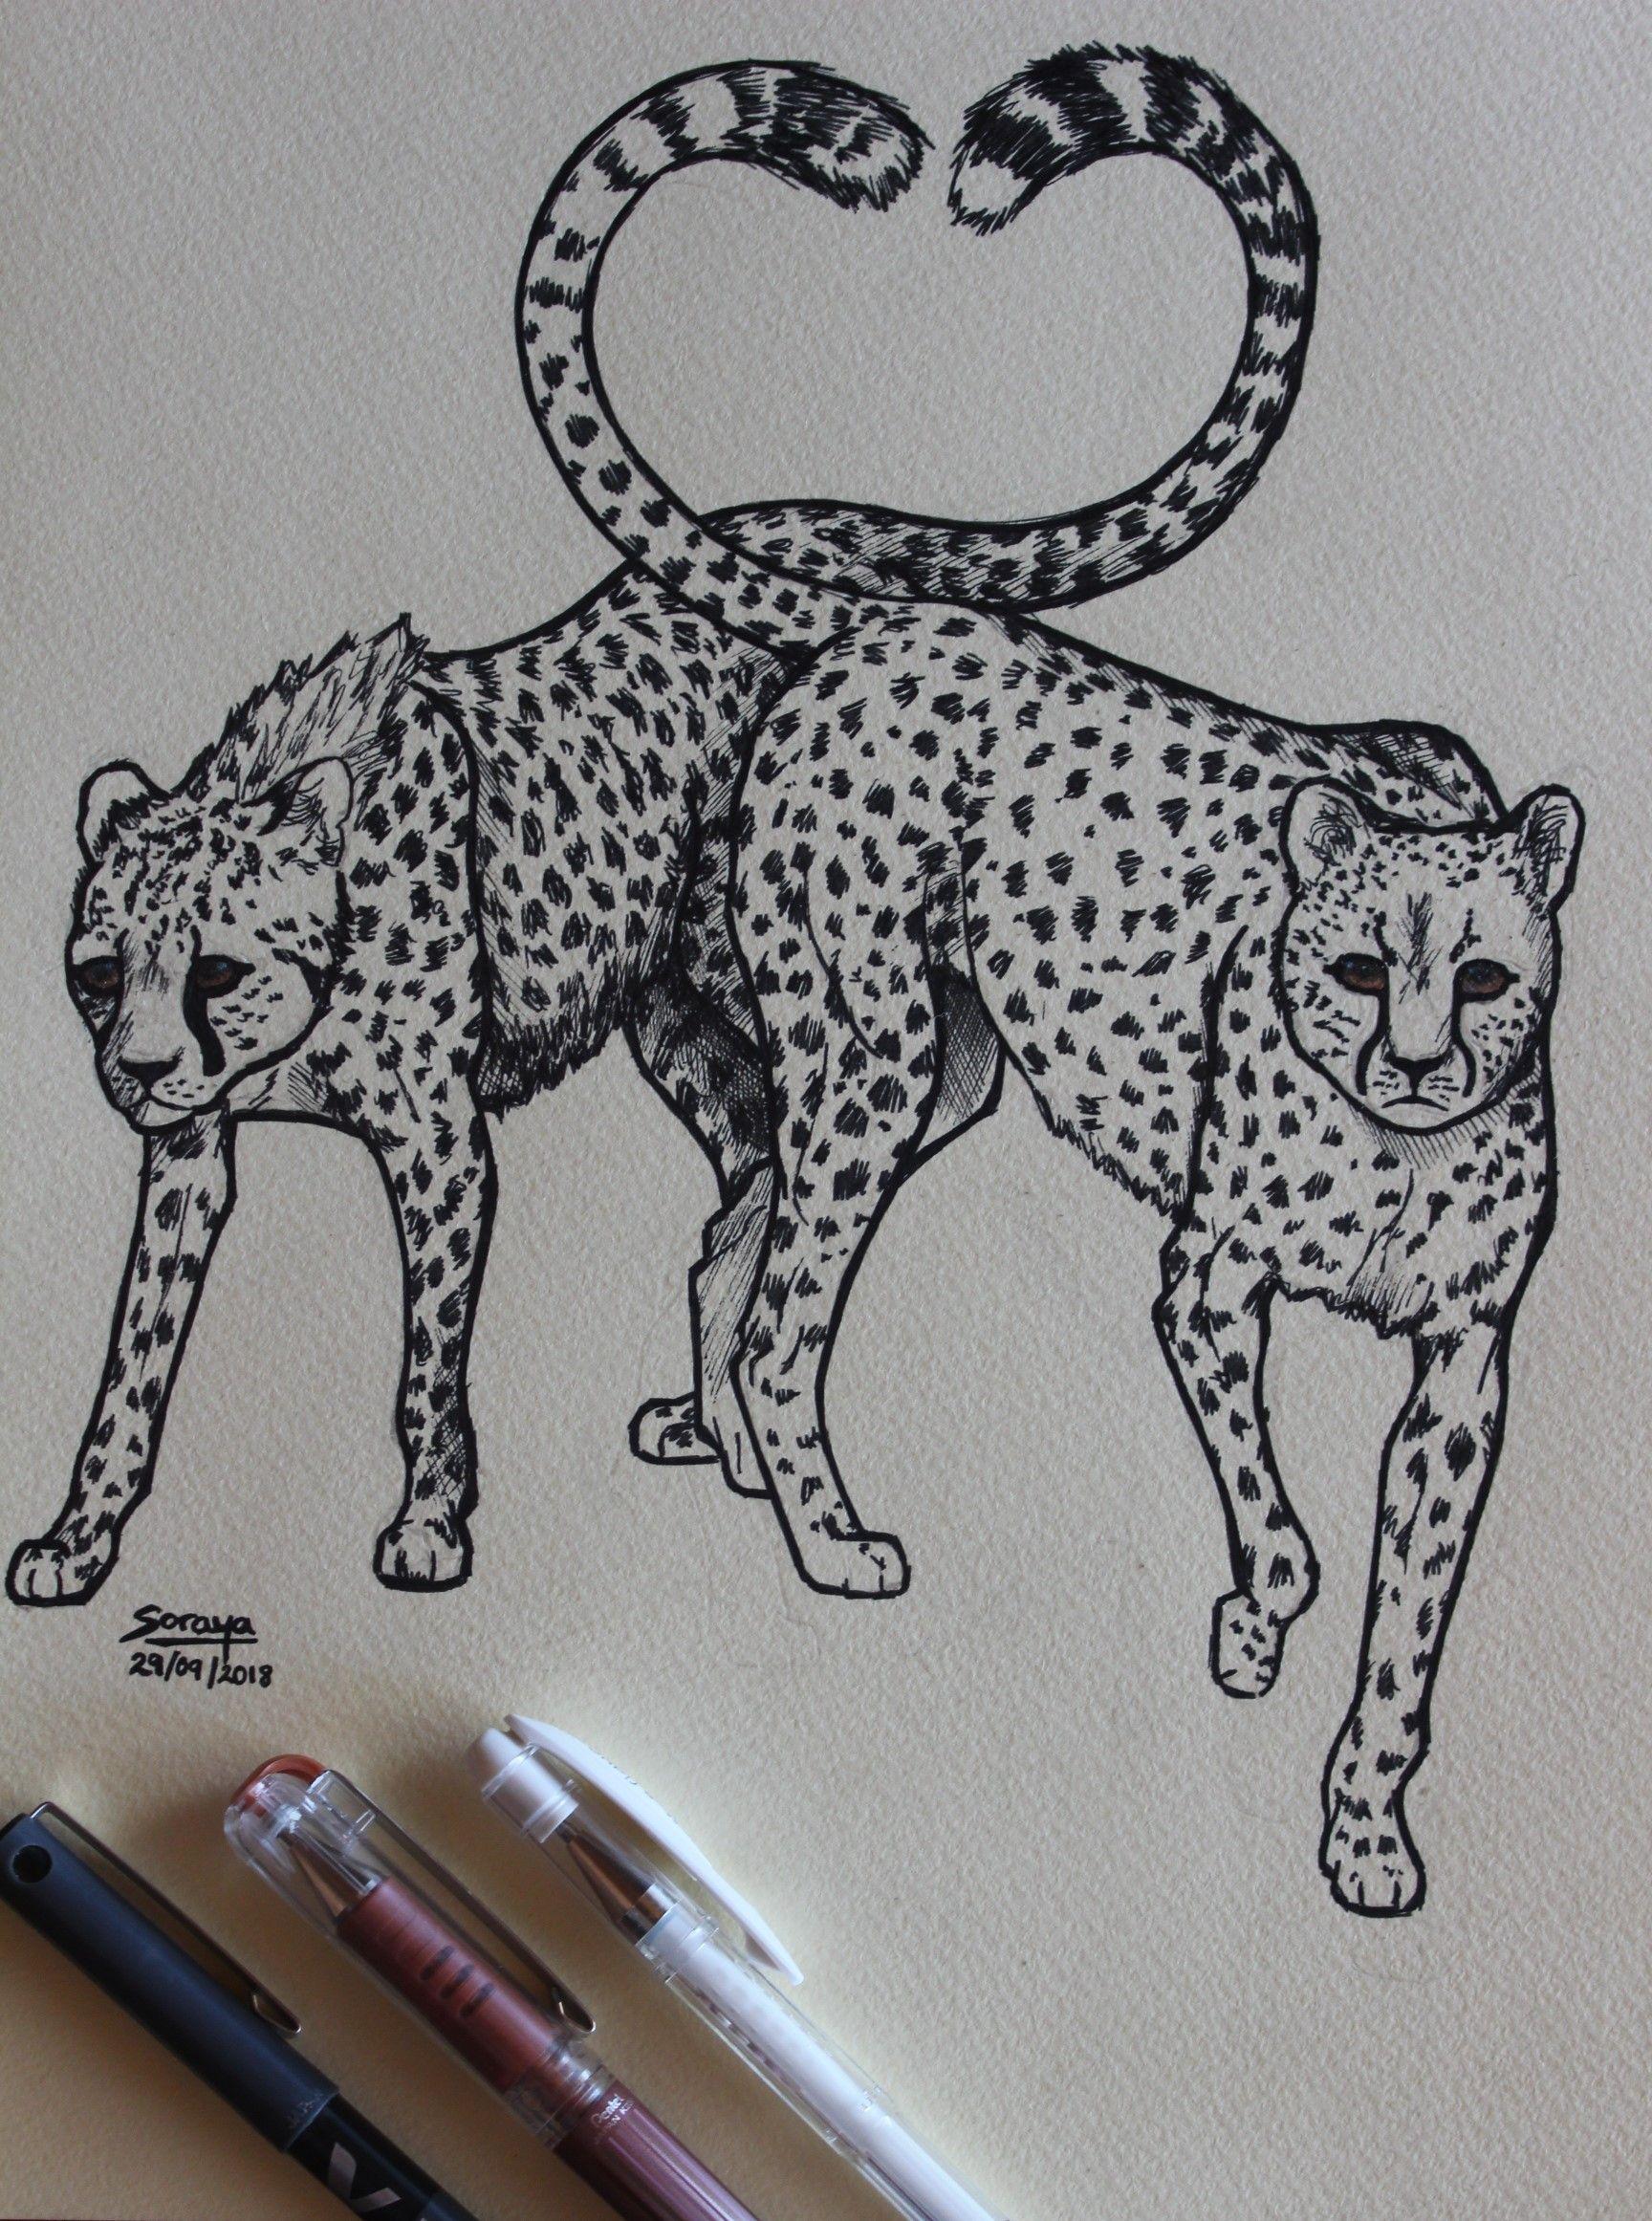 Drawing using ink pens  * * * #cheetah #animals #love #amor #animals #animalart #artdrawings #art #arte #ink #pens #caneta #penart #drawings